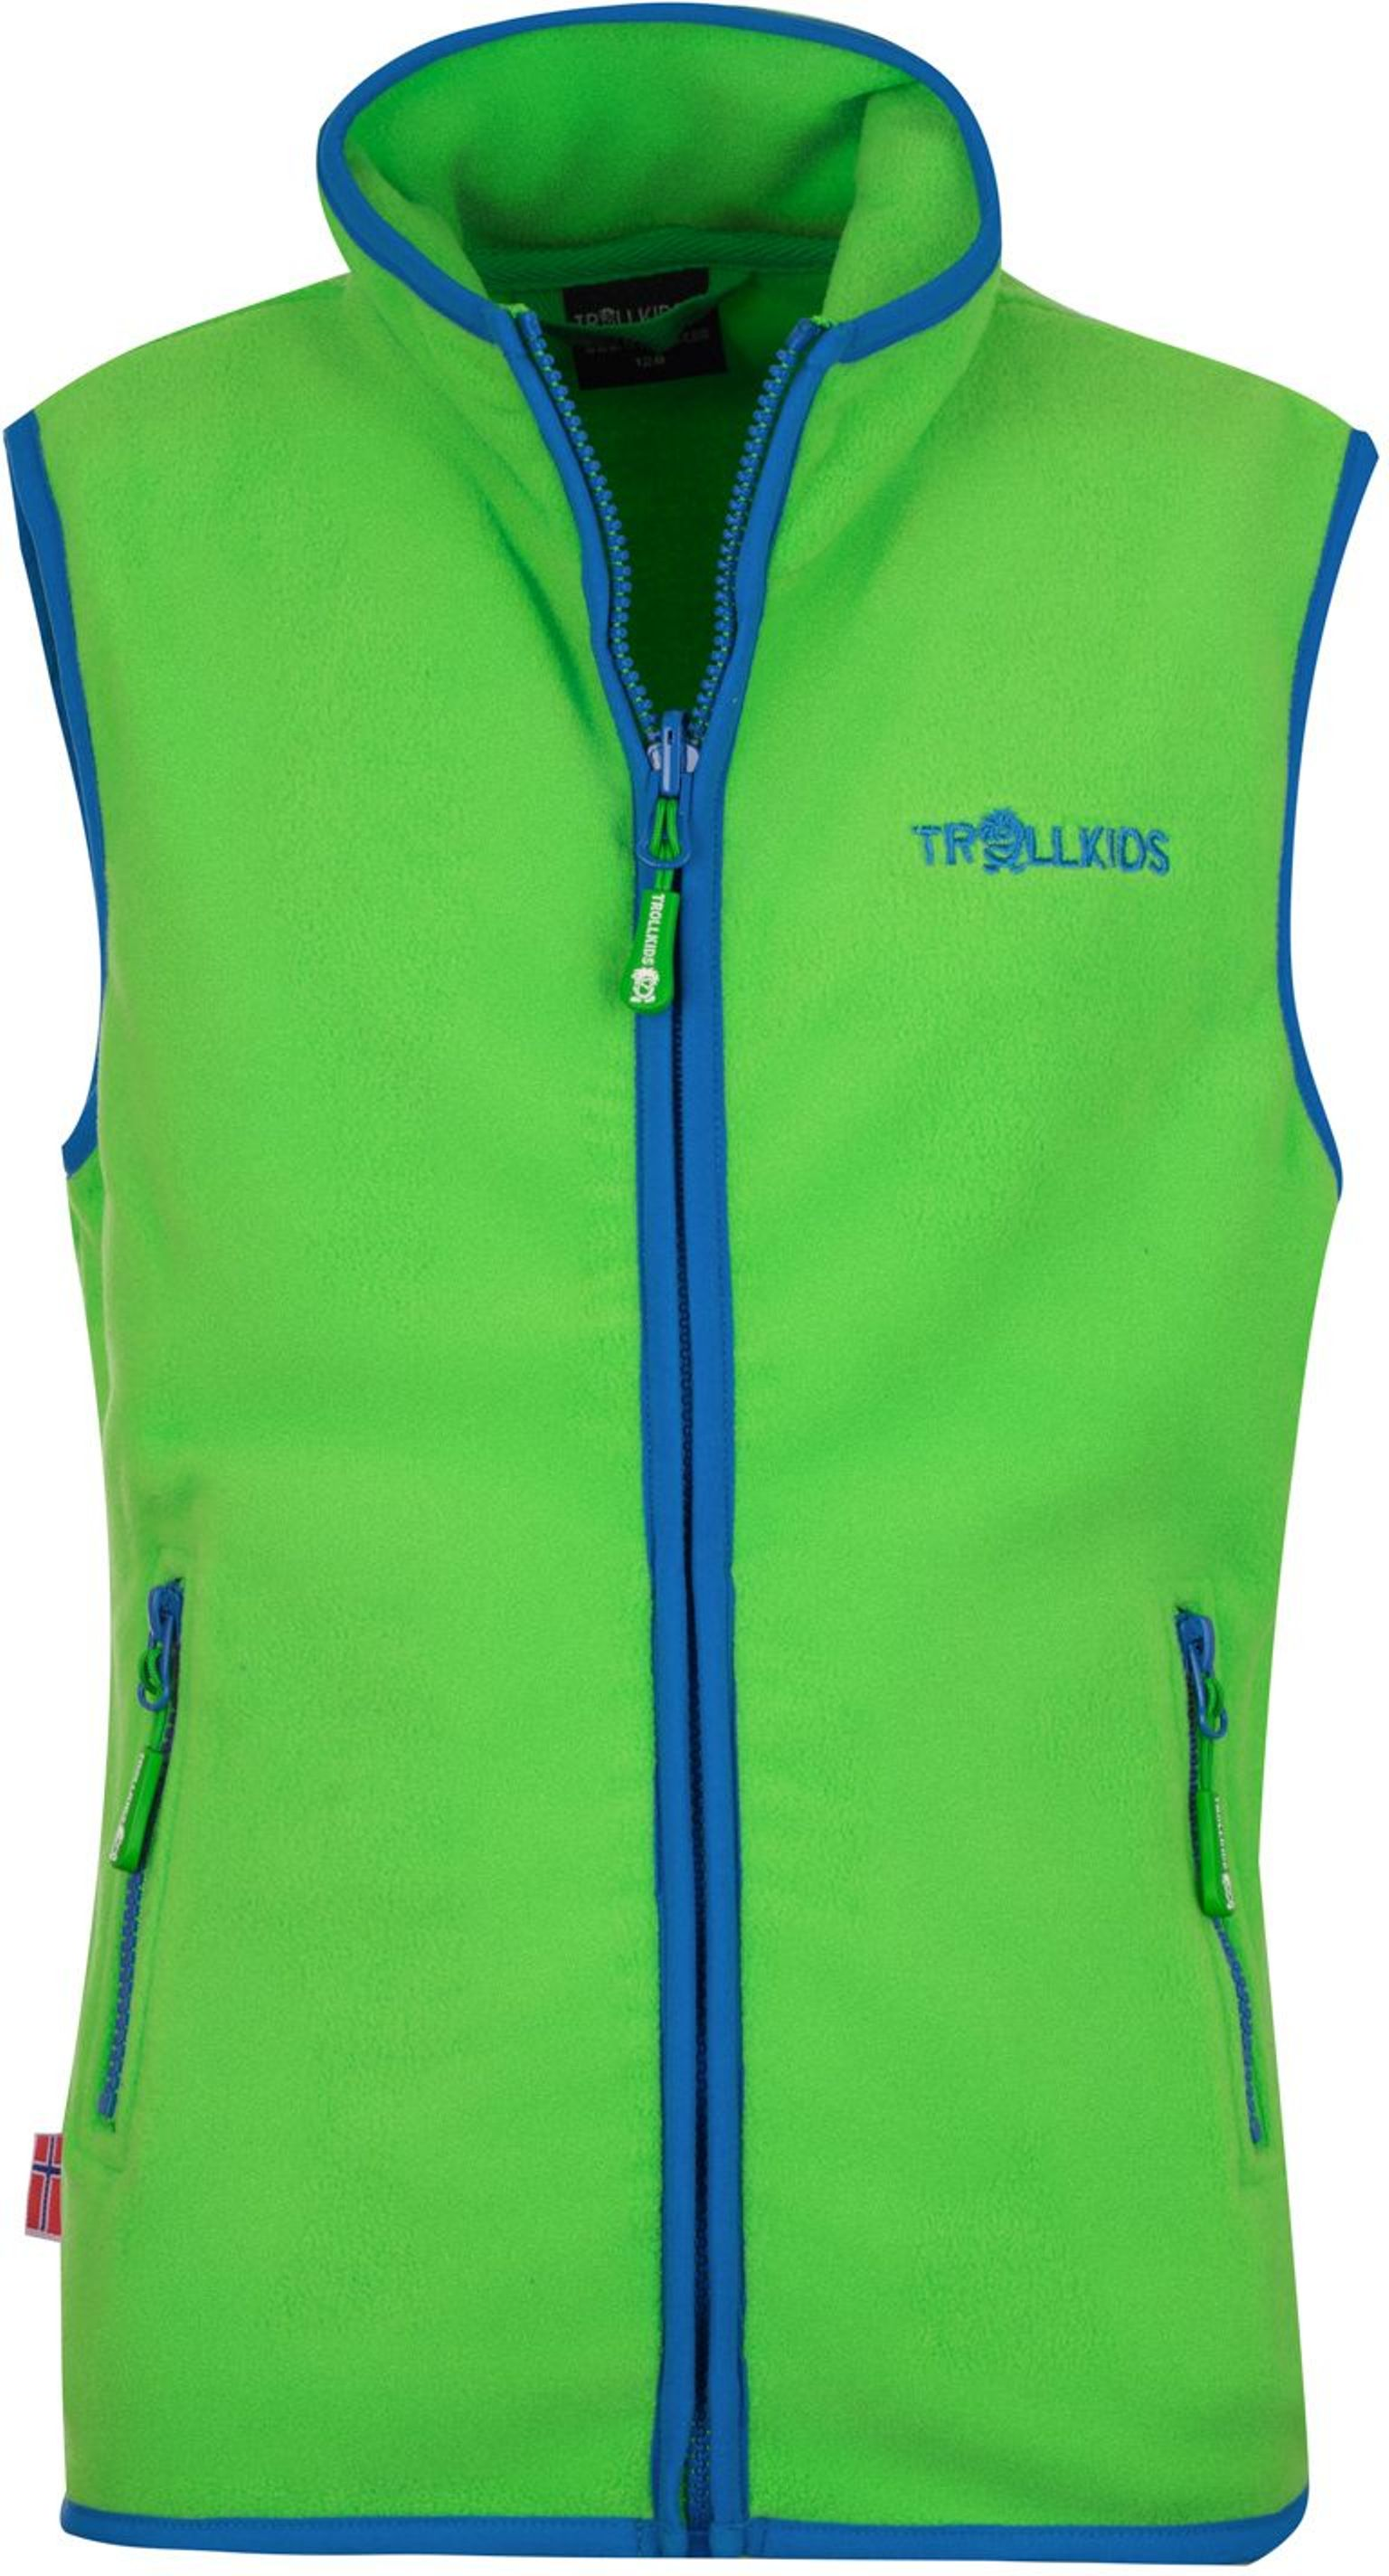 Trollkids Arendal Fleece Weste bright green